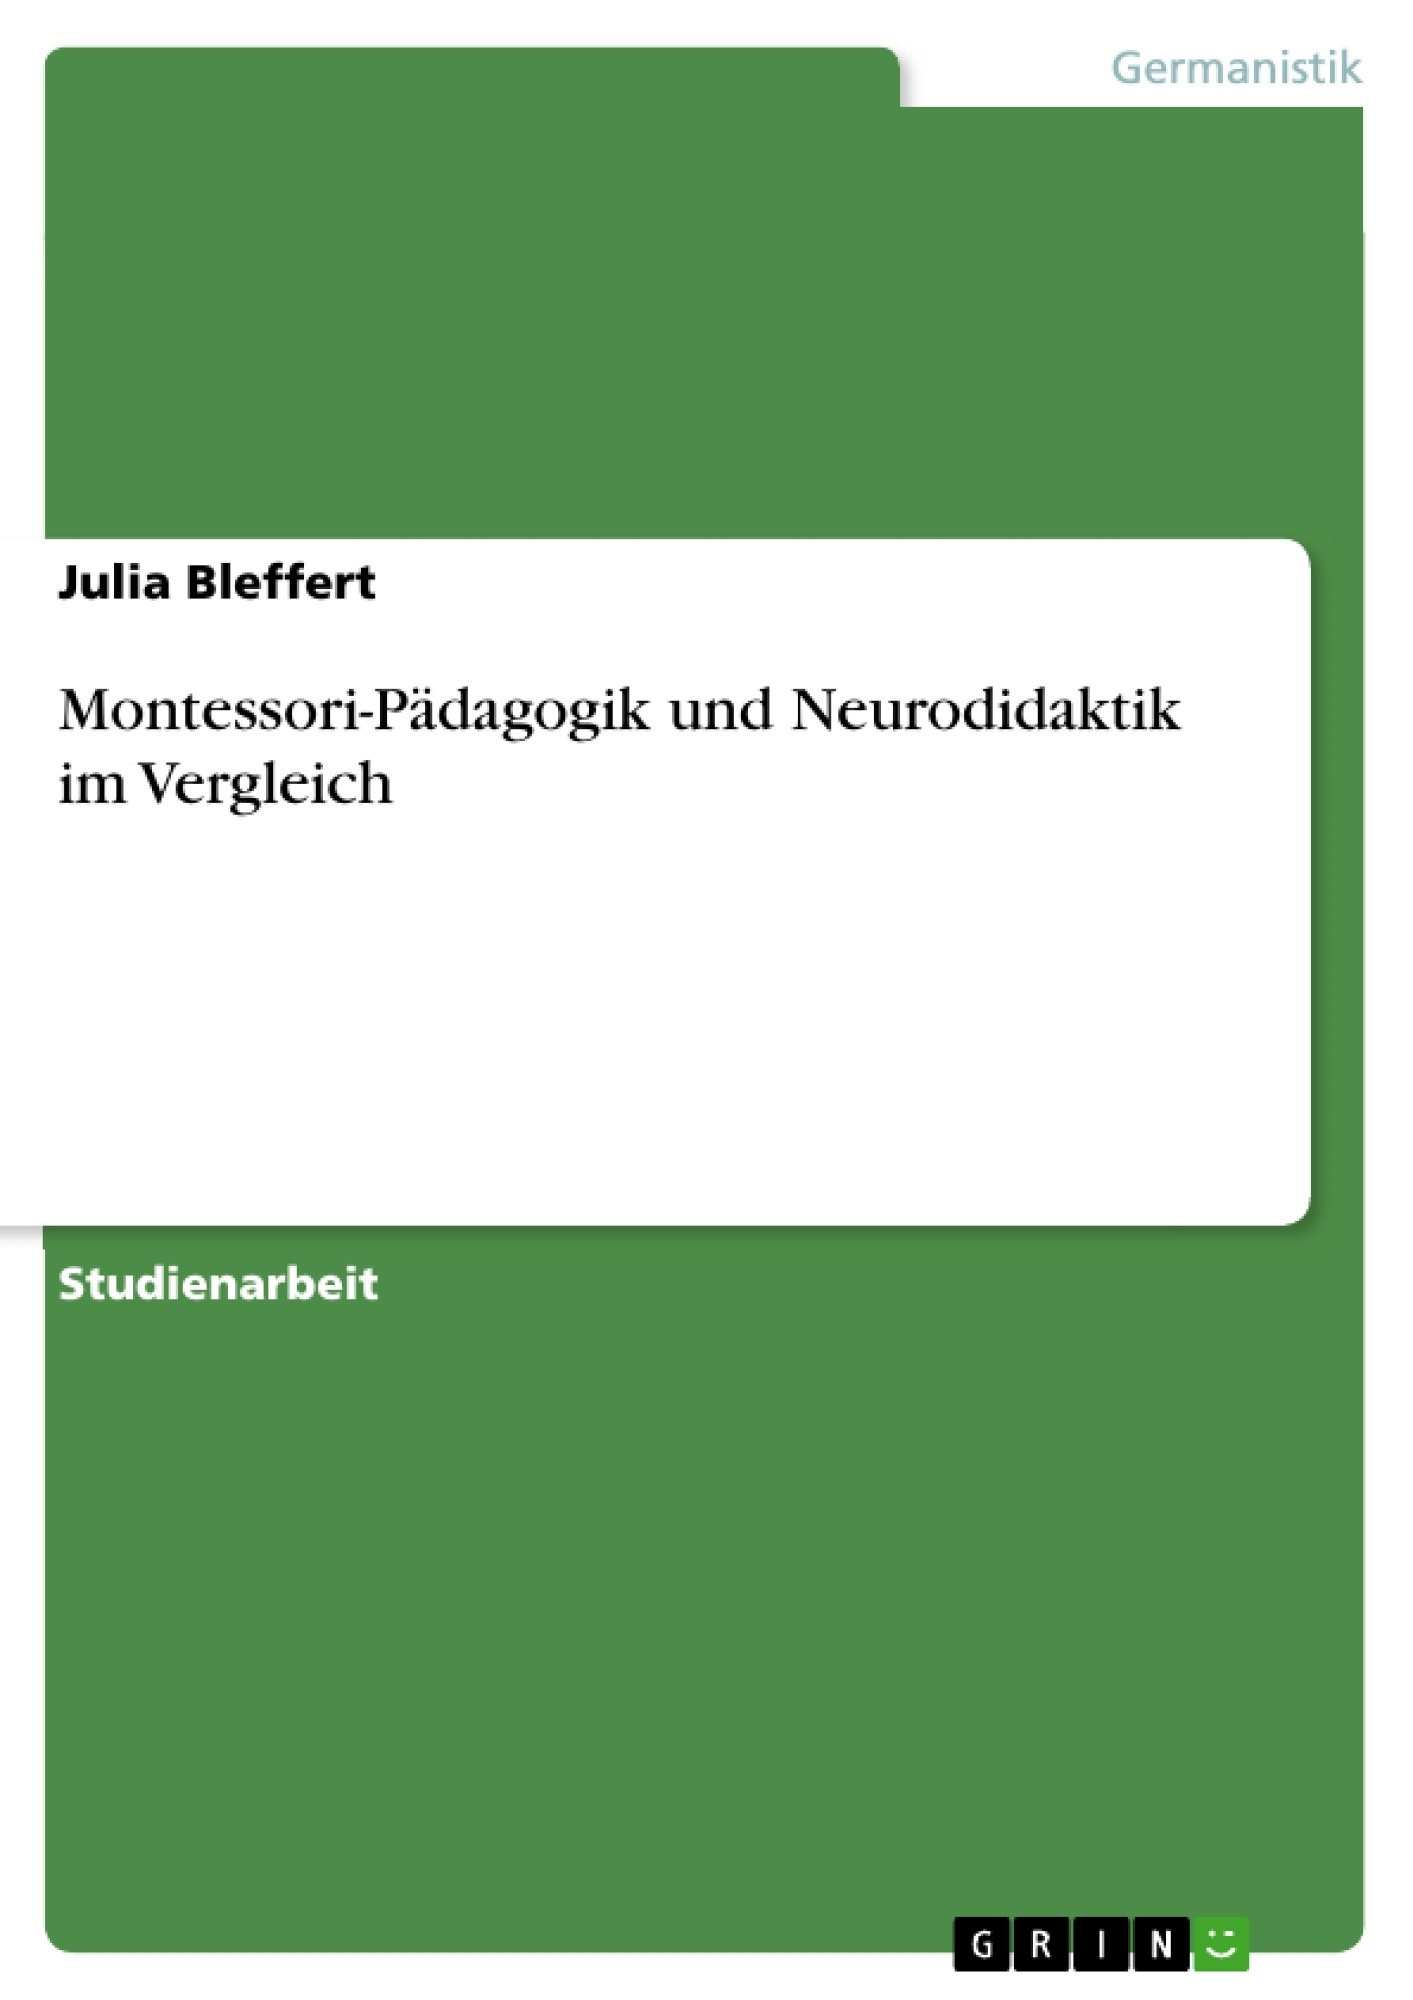 Titel: Montessori-Pädagogik und Neurodidaktik im Vergleich